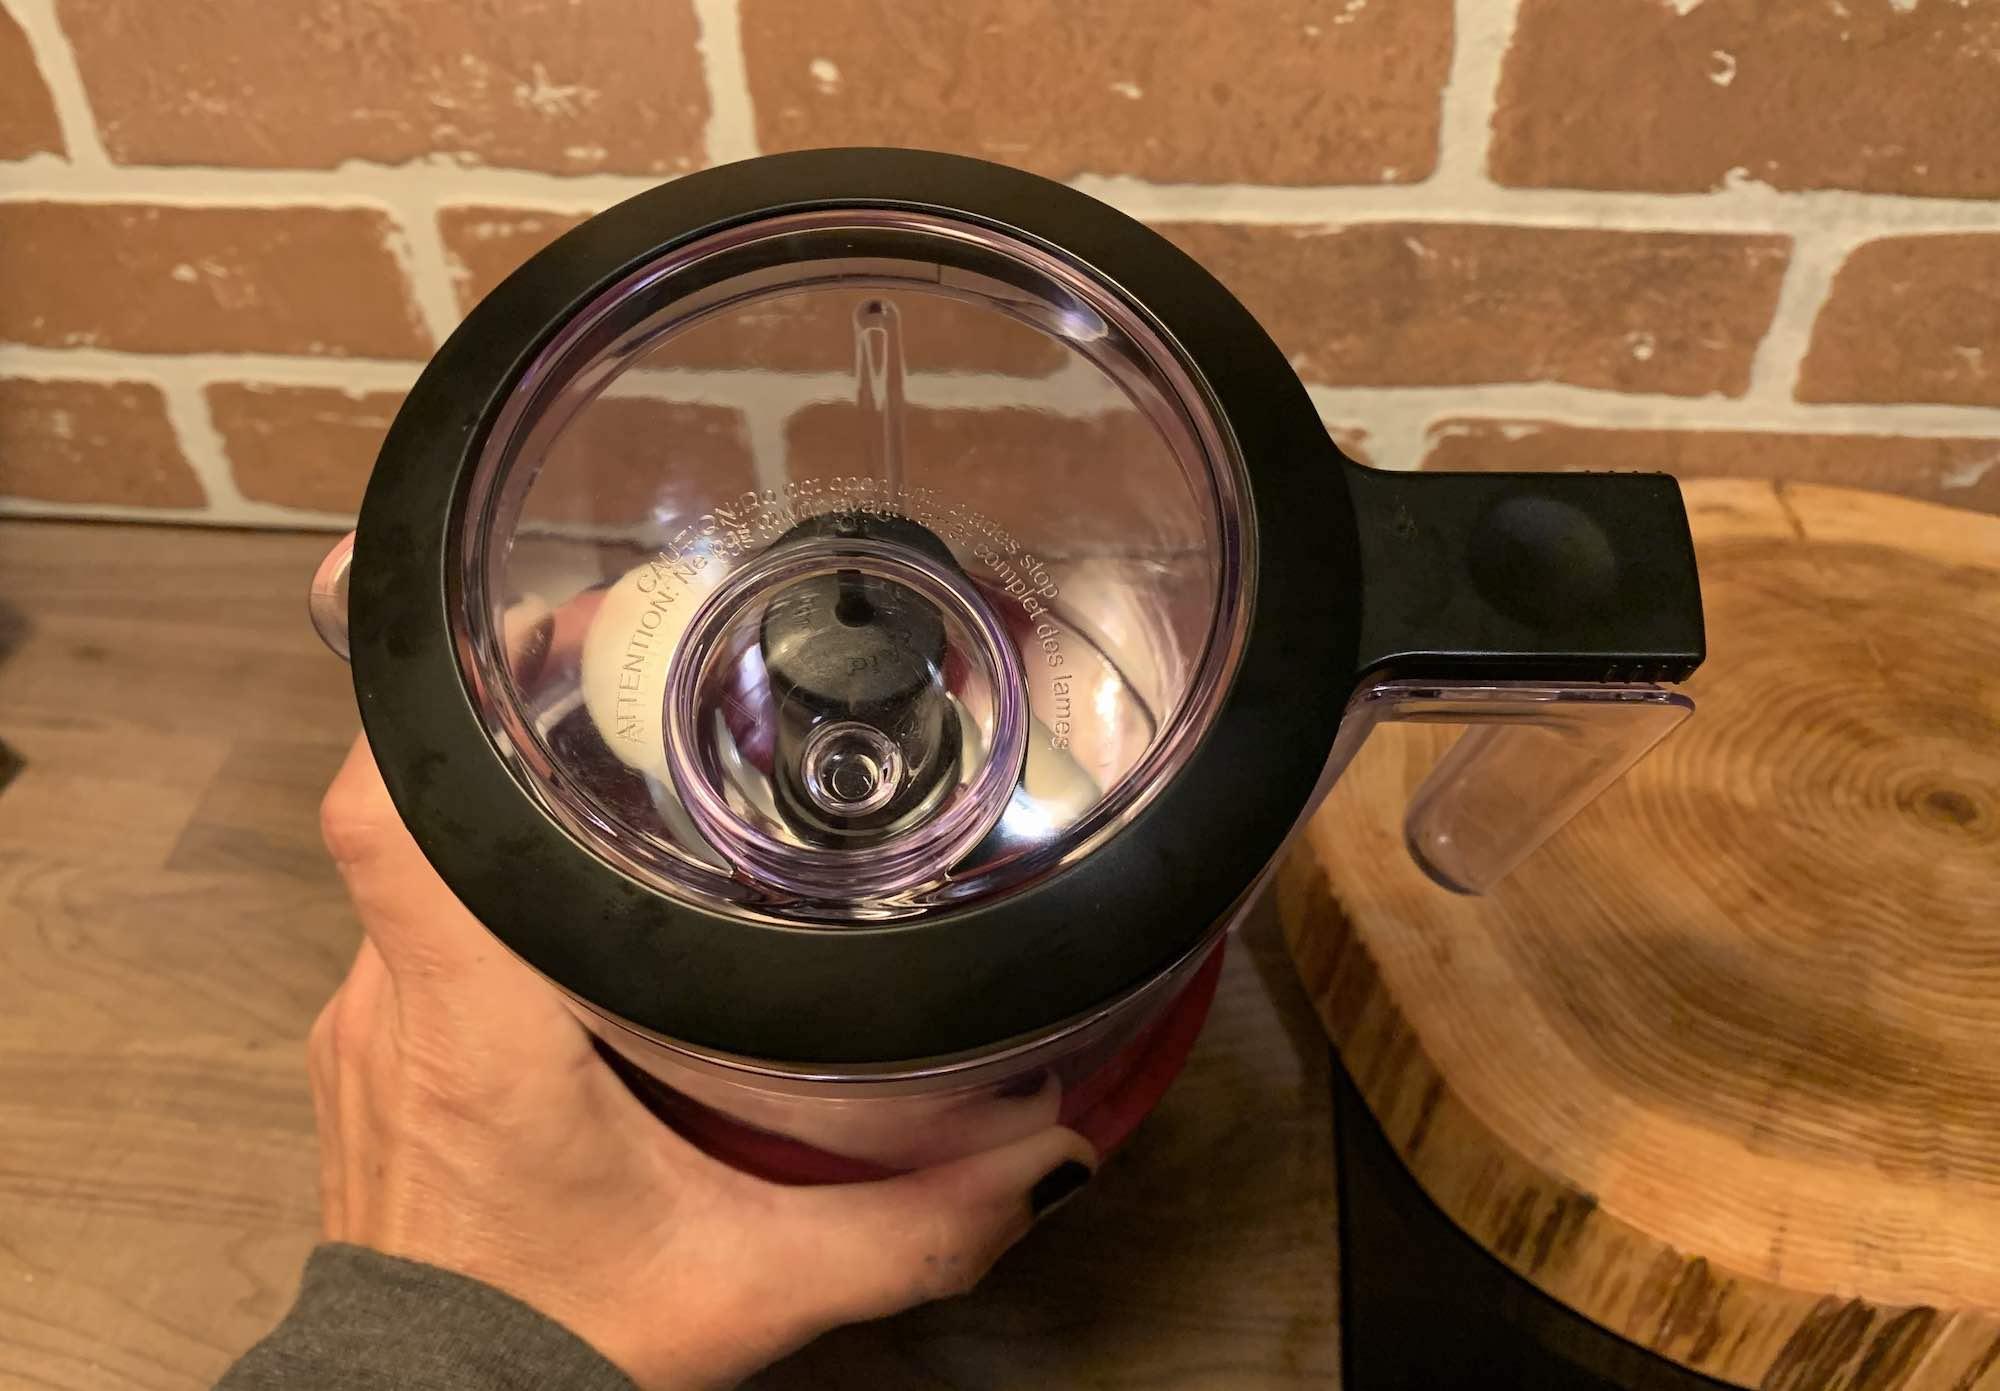 KitchenAid Cordless Chopper Drizzle Bowl on lid